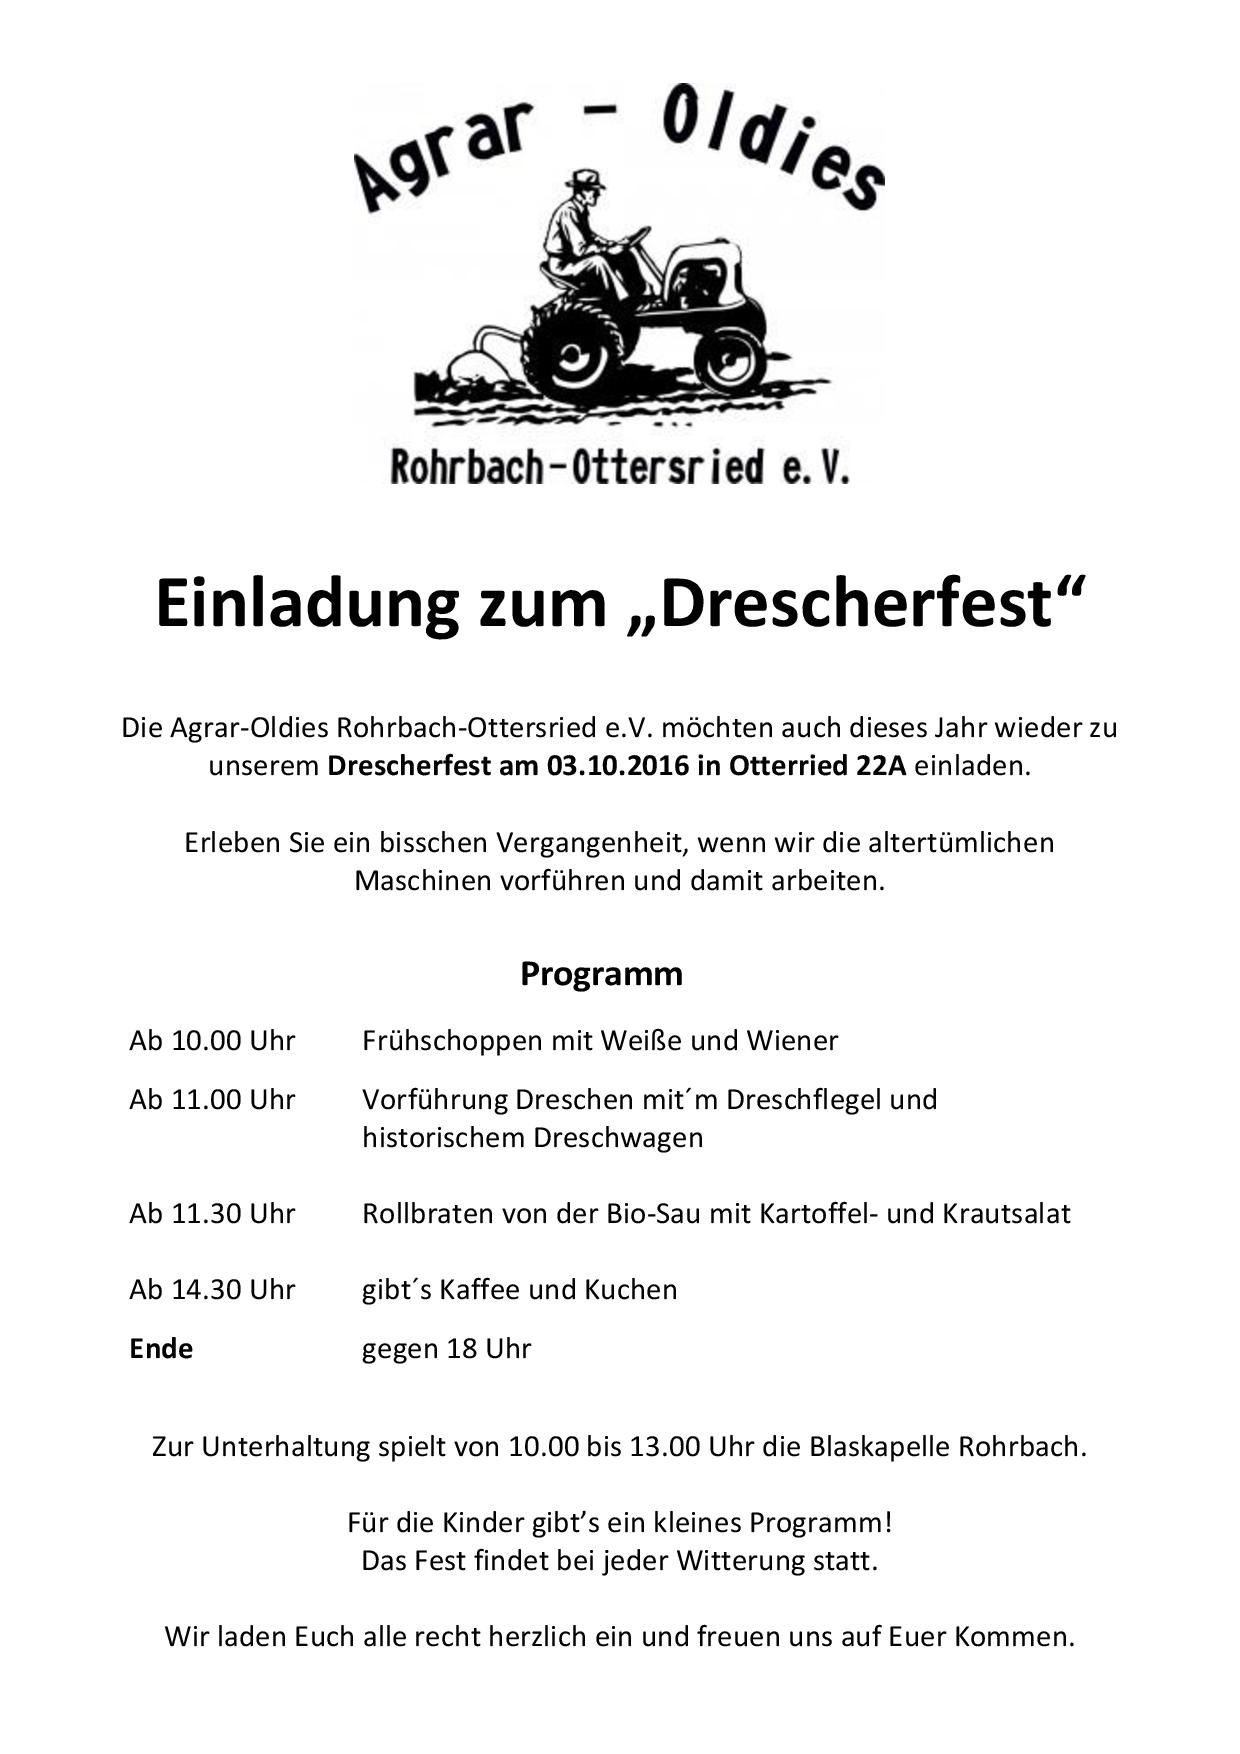 Einladung Drescherfest 2016